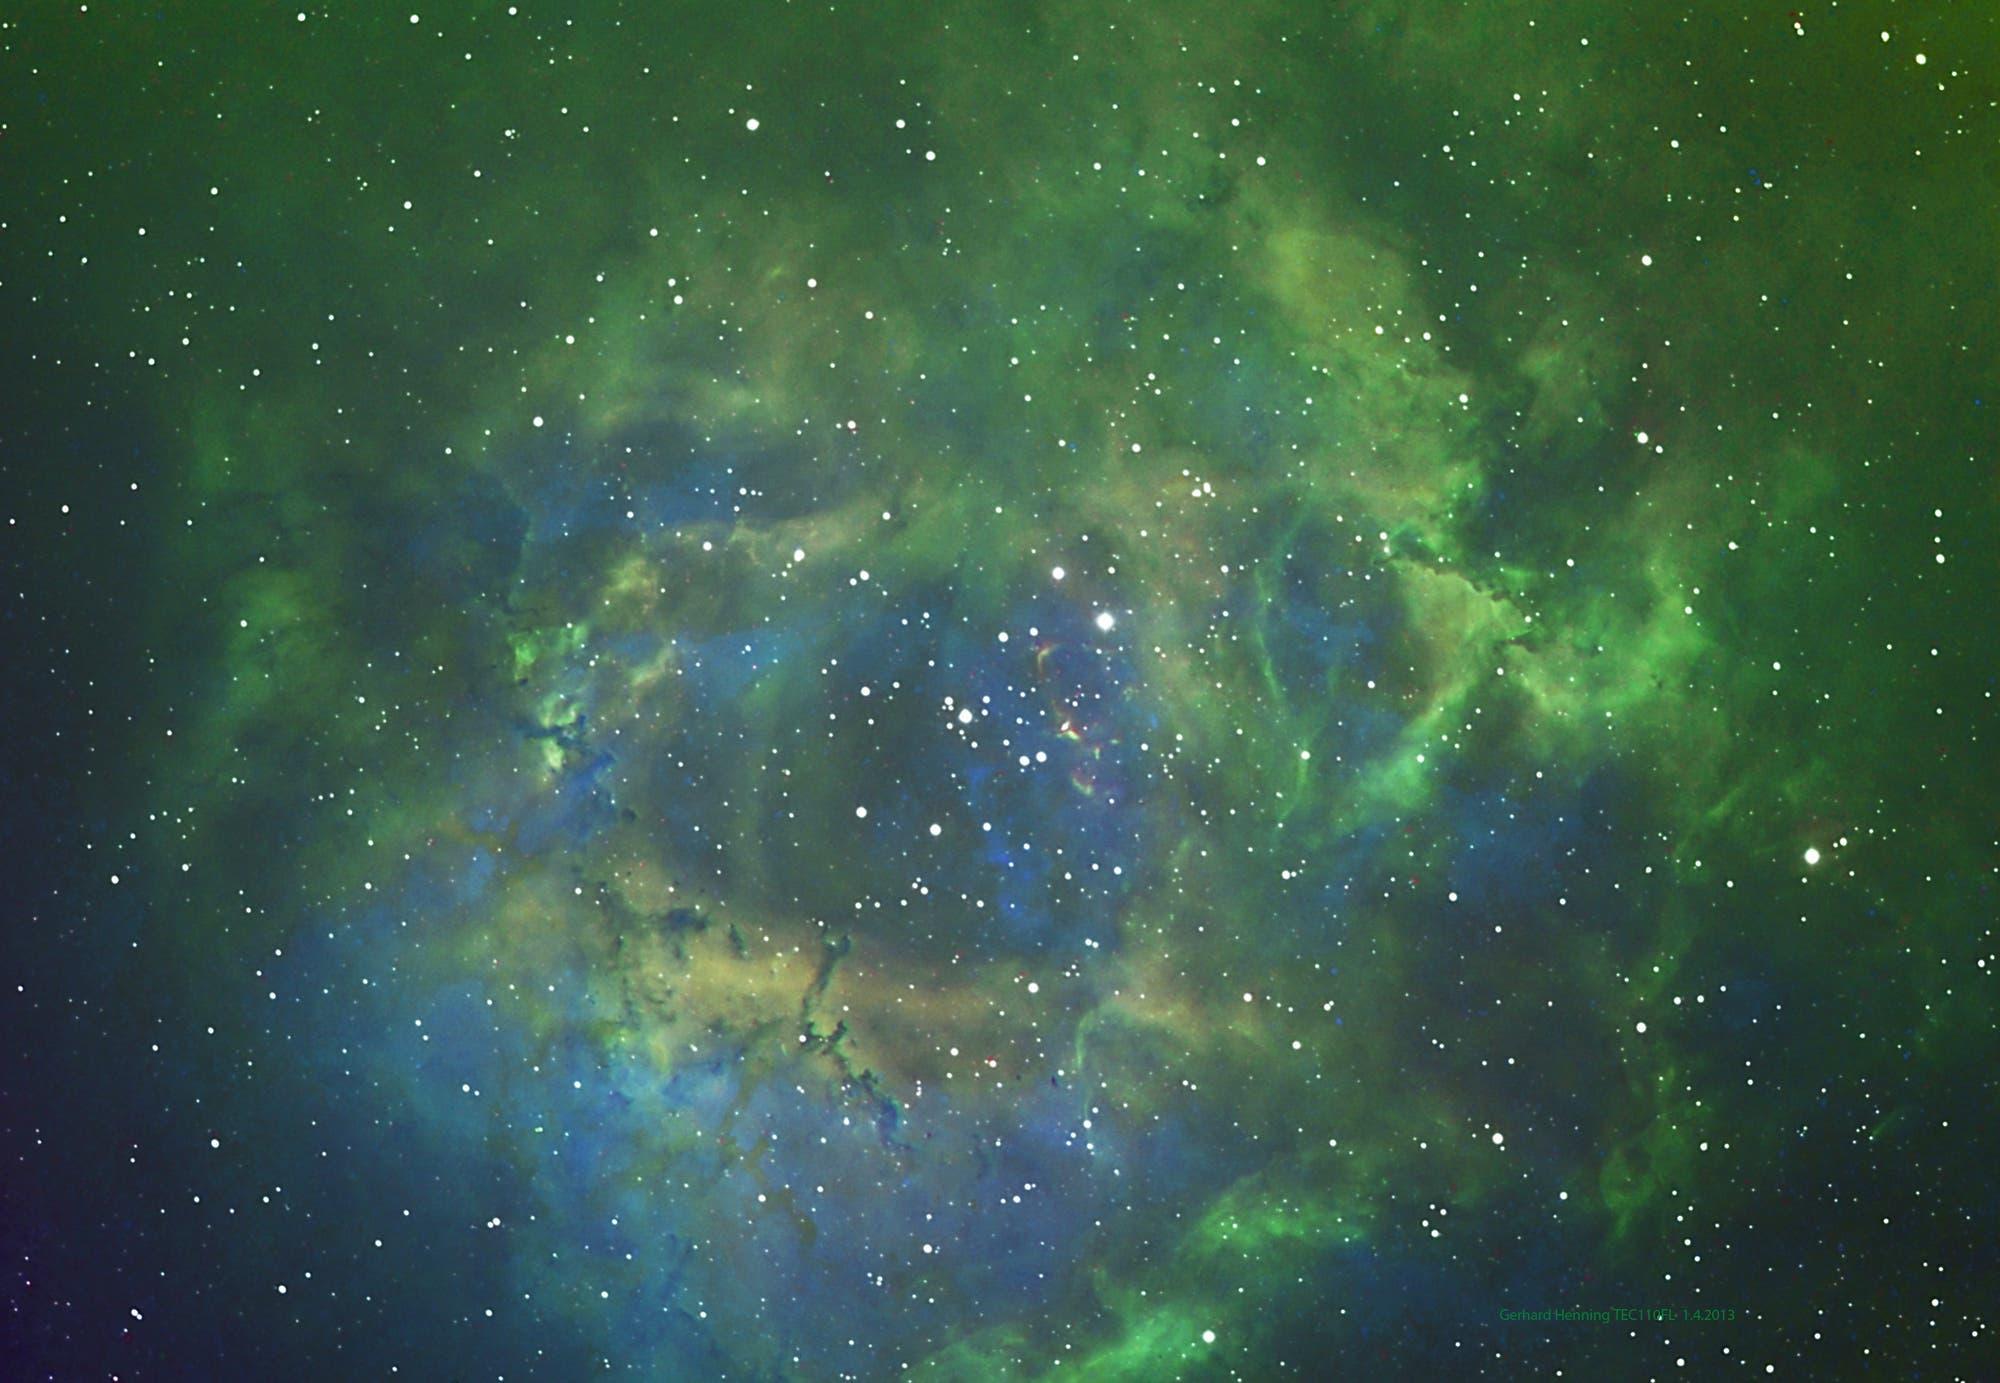 NGC-2244 Bicolor